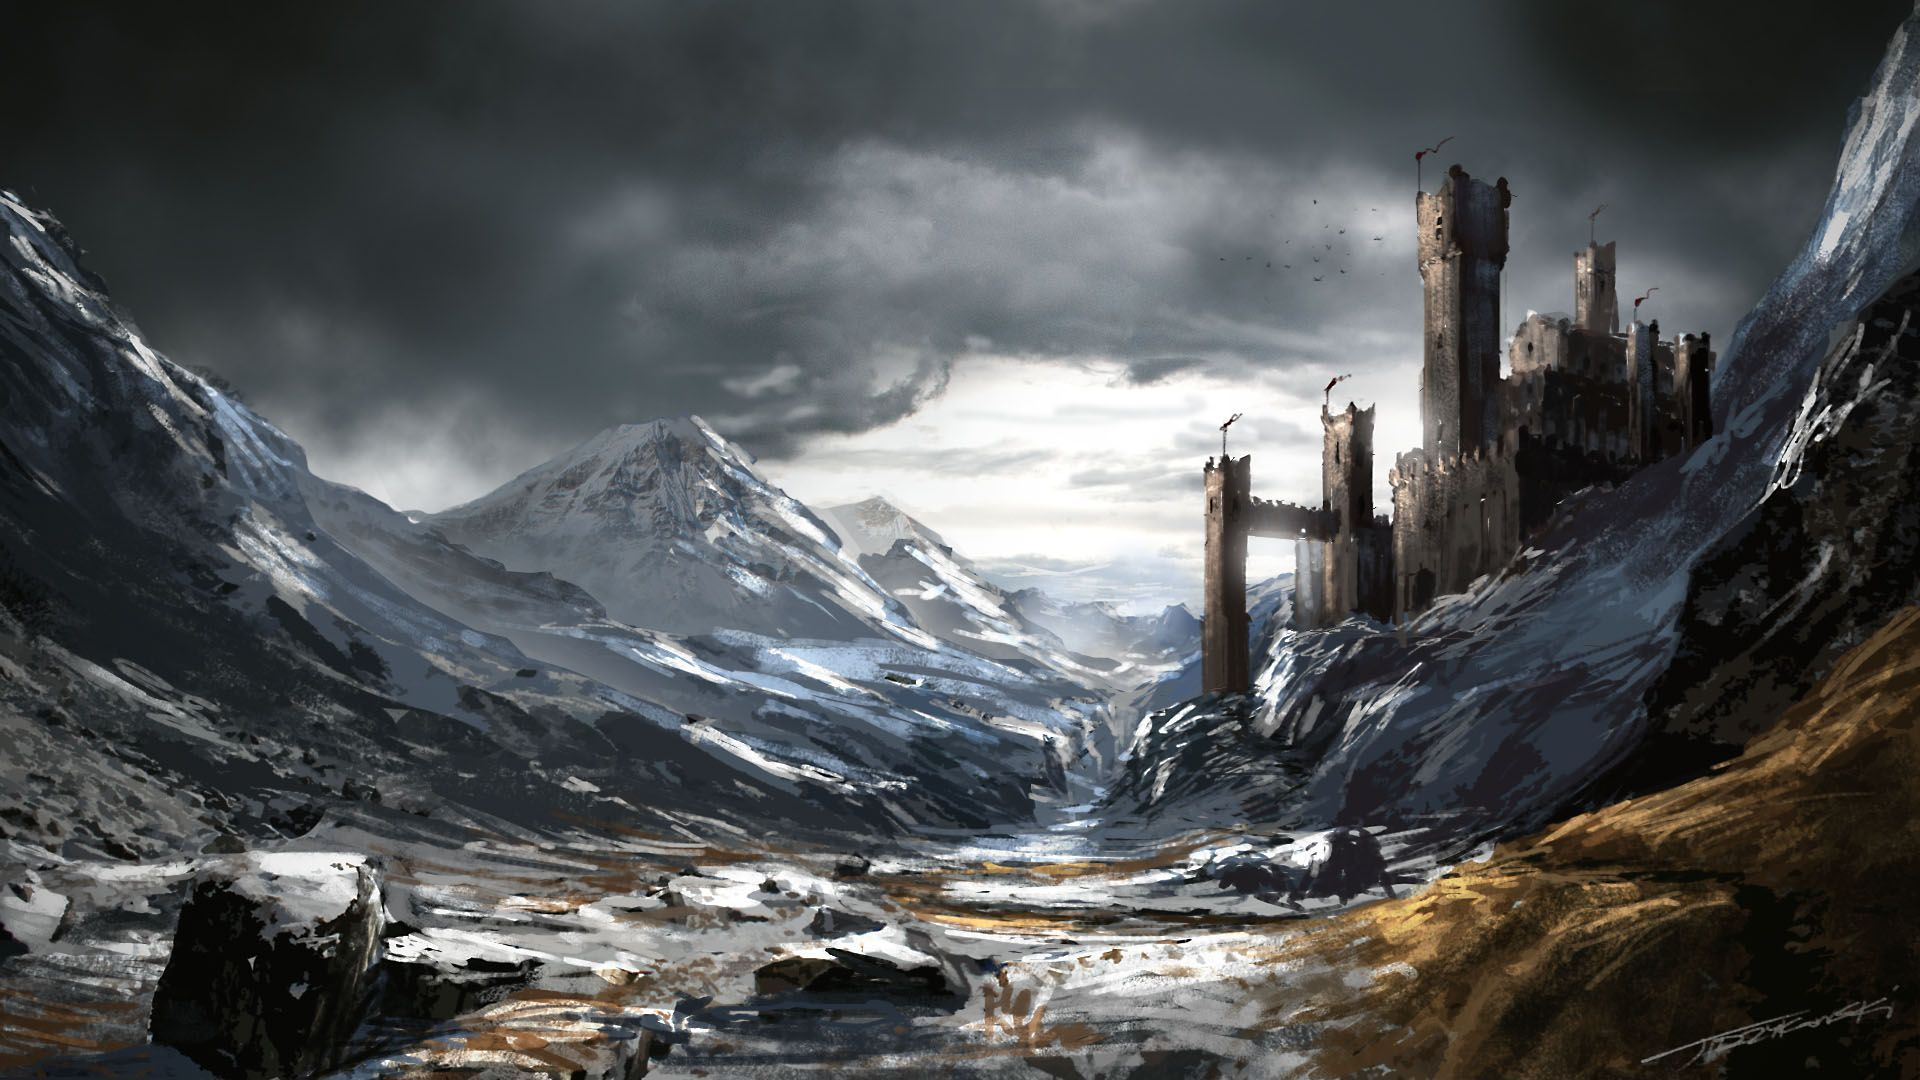 Game of Thrones Landscape fanart